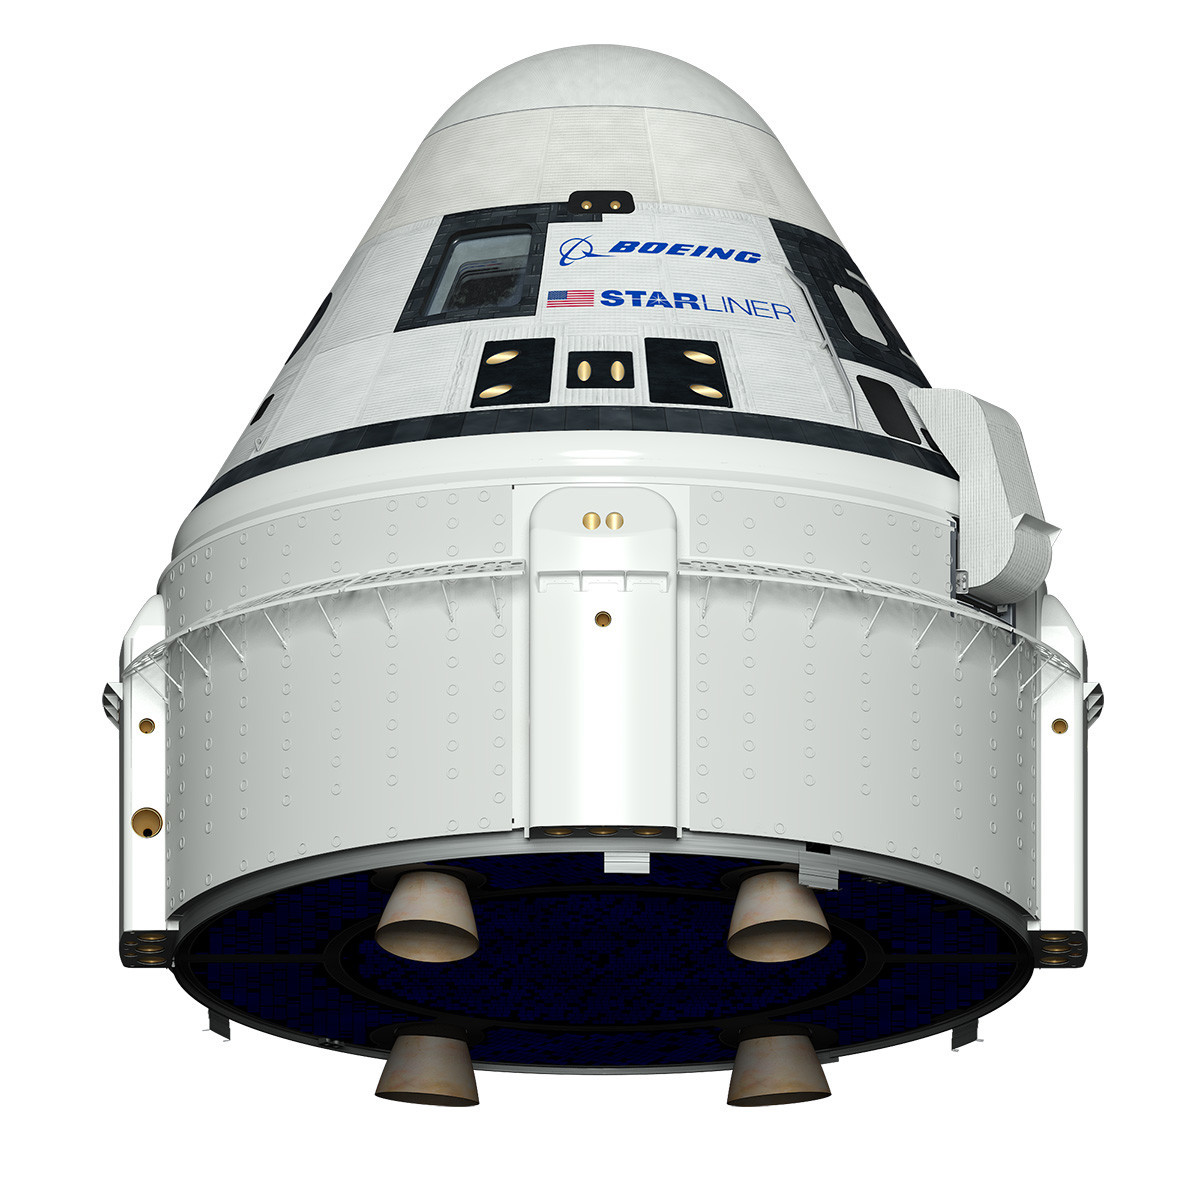 A rendering of Boeing's CST-100 Starliner capsule.